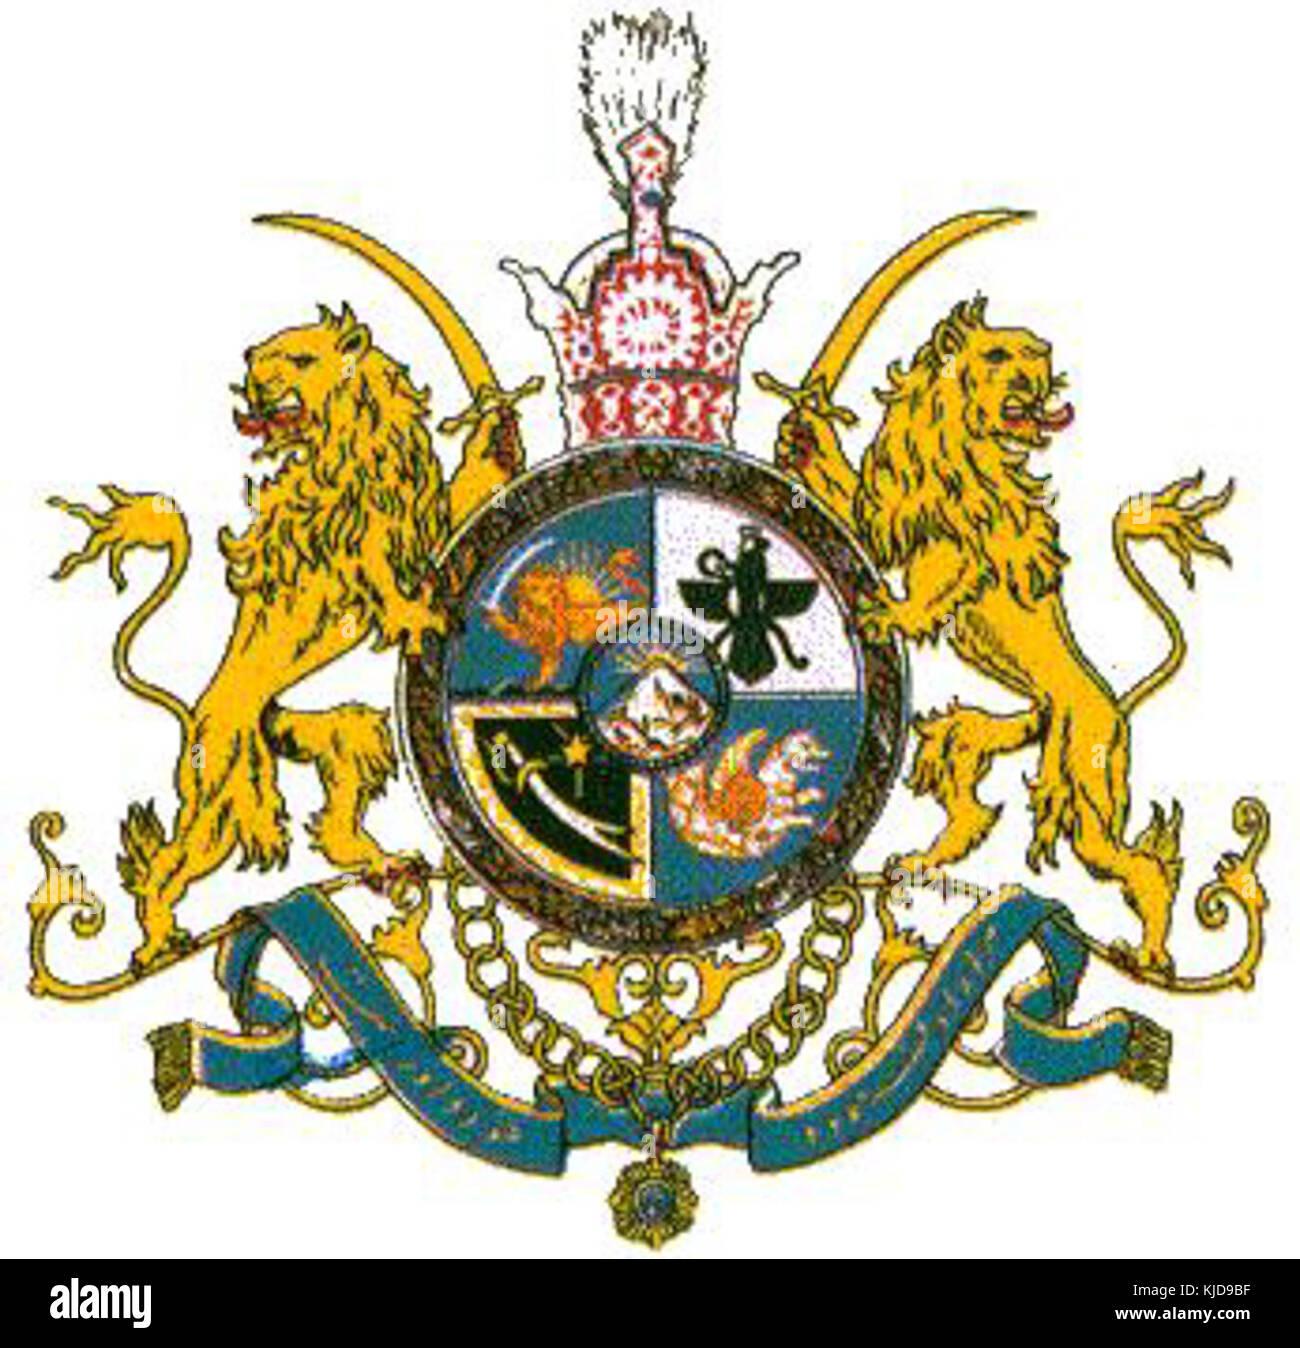 Coat of arms of iran stock photos coat of arms of iran stock coat of arms of pahlavi dynasty and iran stock image buycottarizona Choice Image